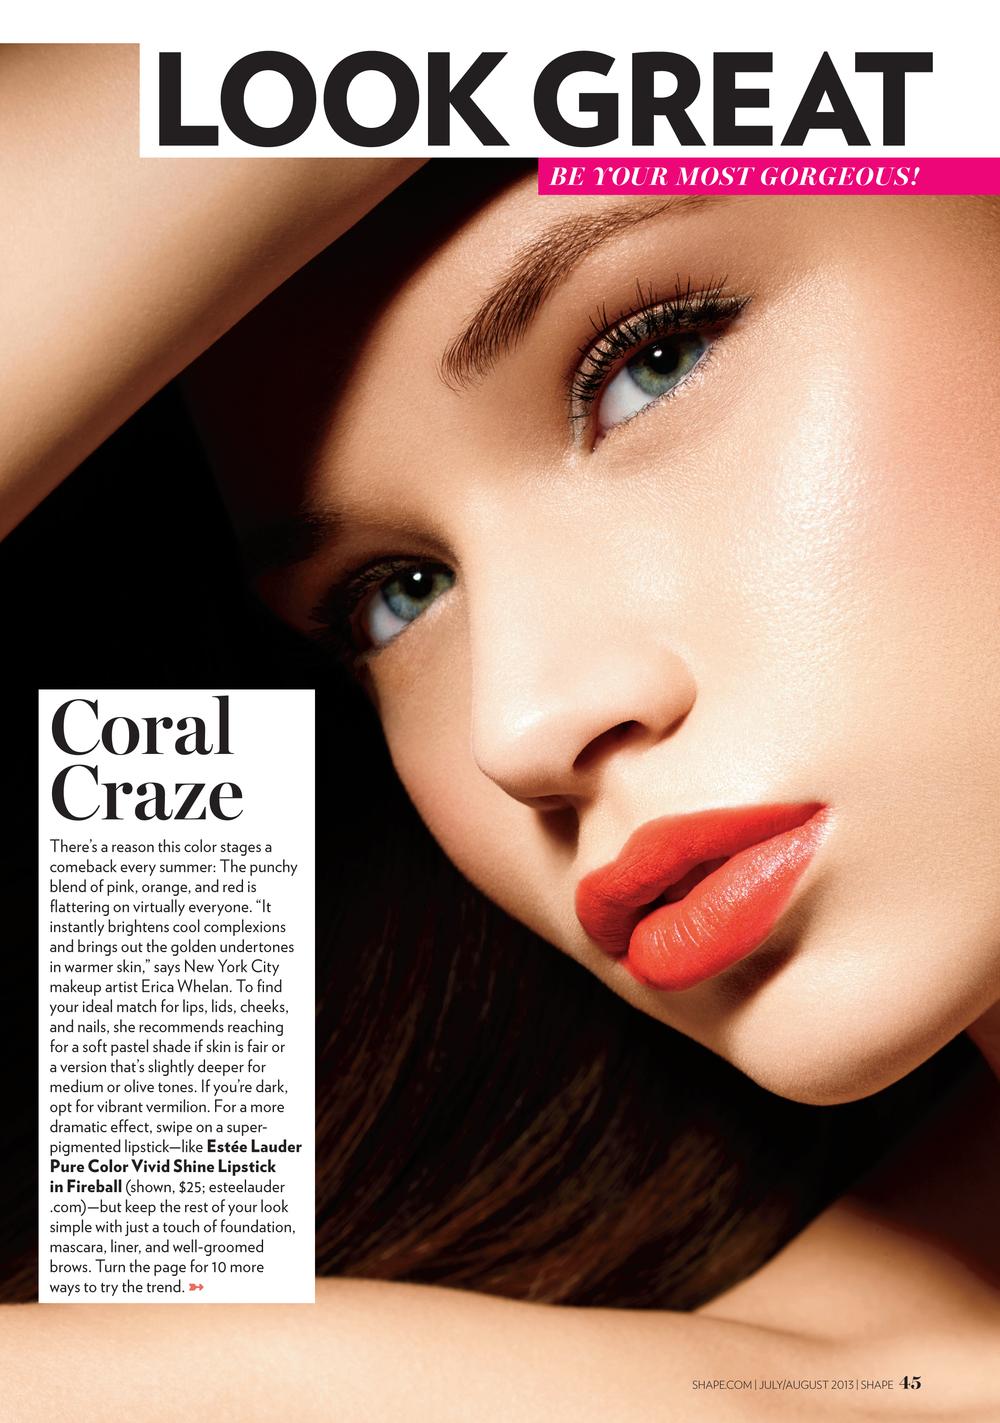 Coral Craze, July 2013